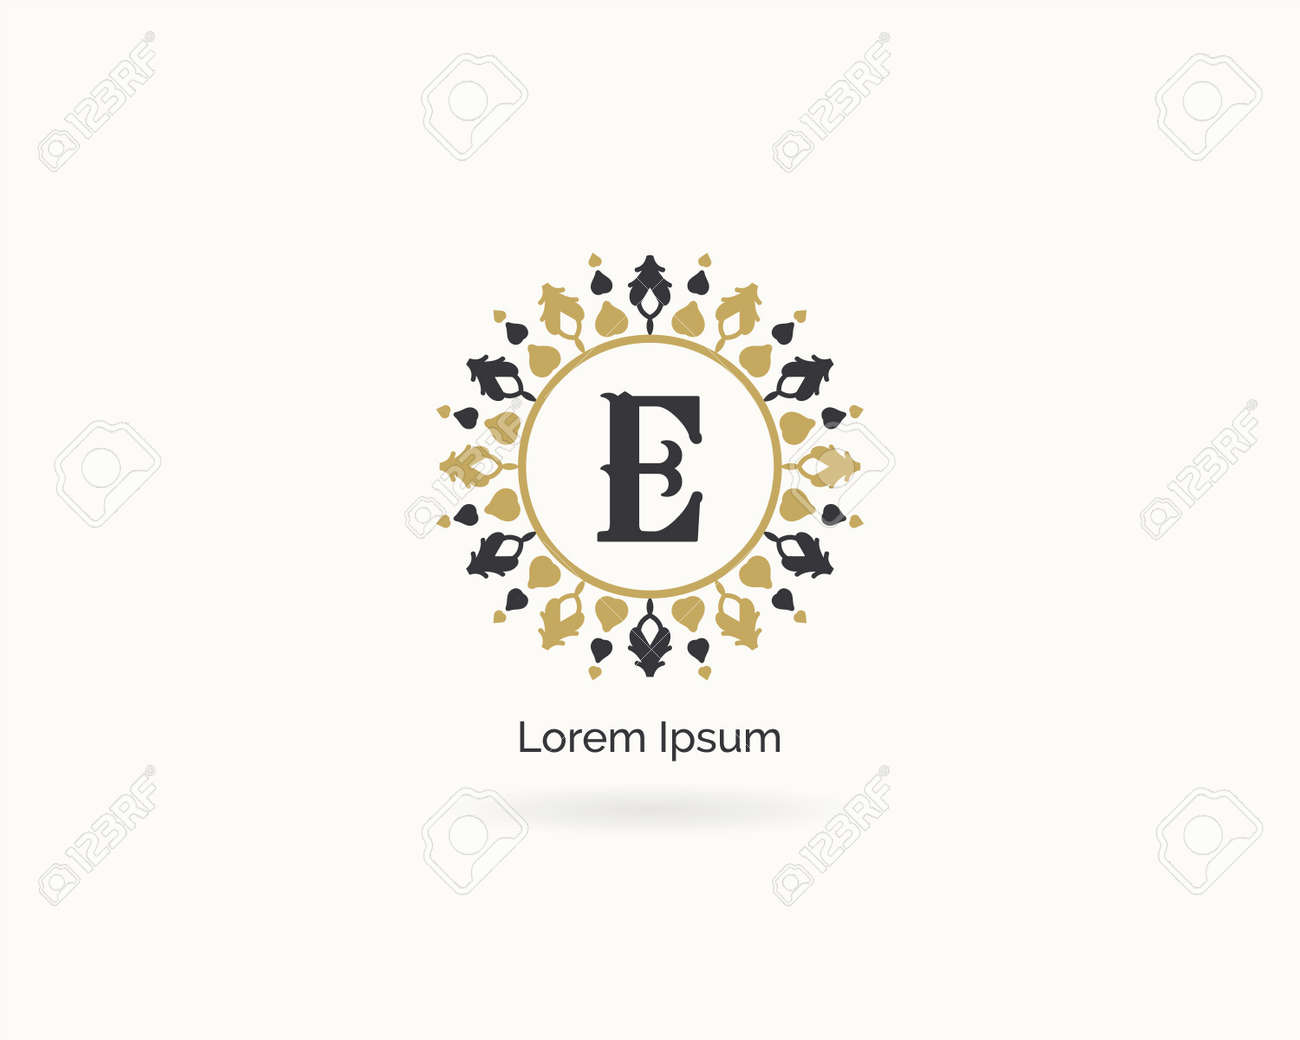 Premium letter e logo icon vector design luxury jewelry frame premium letter e logo icon vector design luxury jewelry frame gem edge logotype spa thecheapjerseys Images